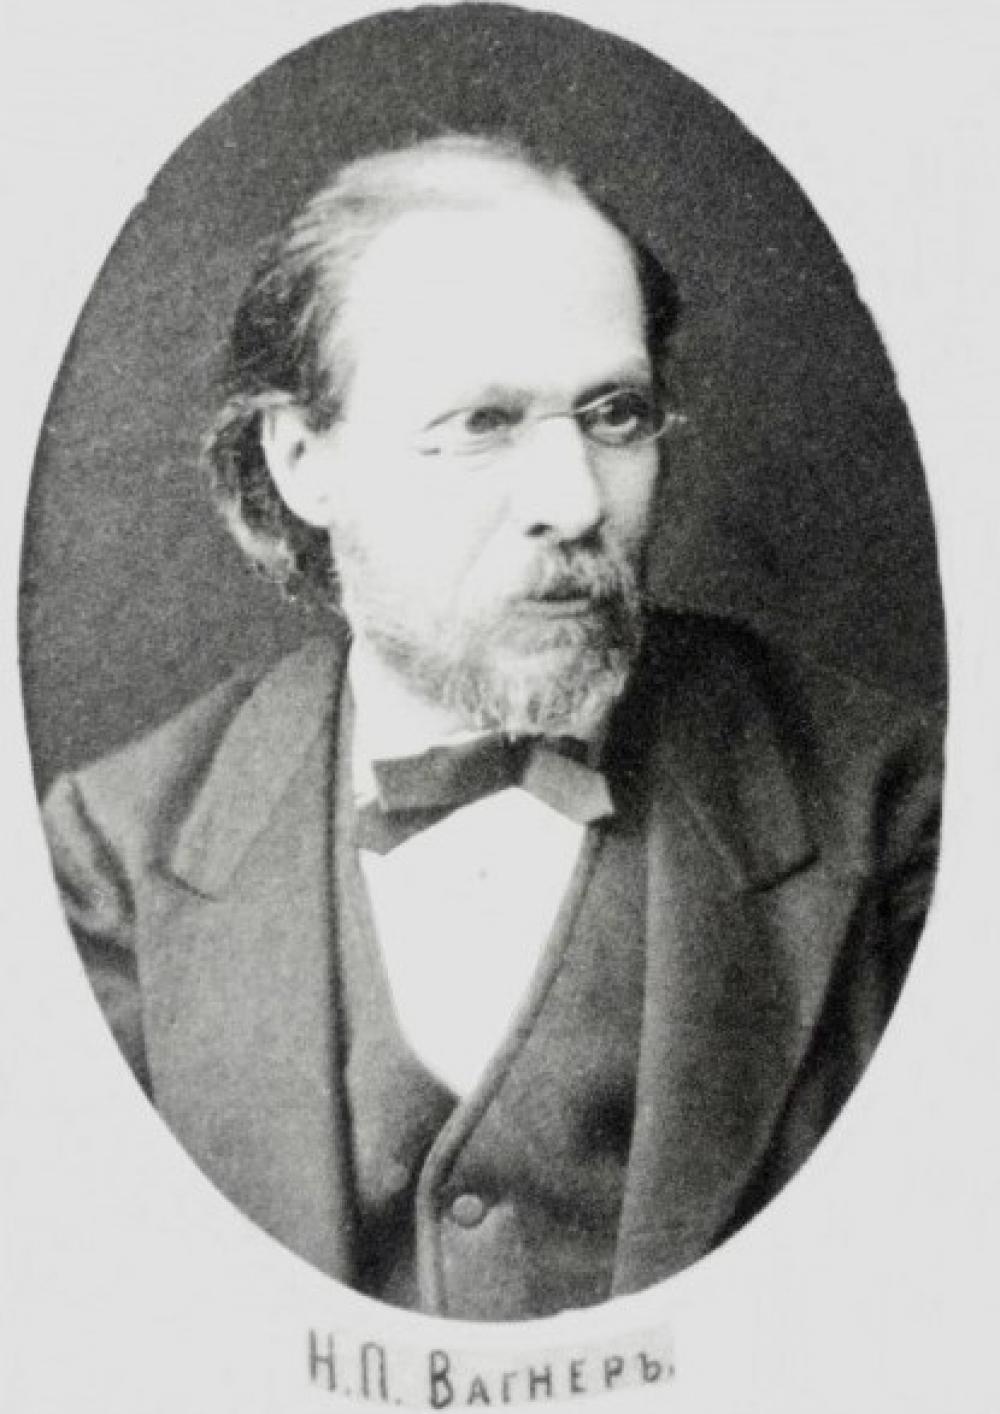 Вагнер Н.П. 1885 г. Архив Музея Д.И. Менделеева, СПбГУ